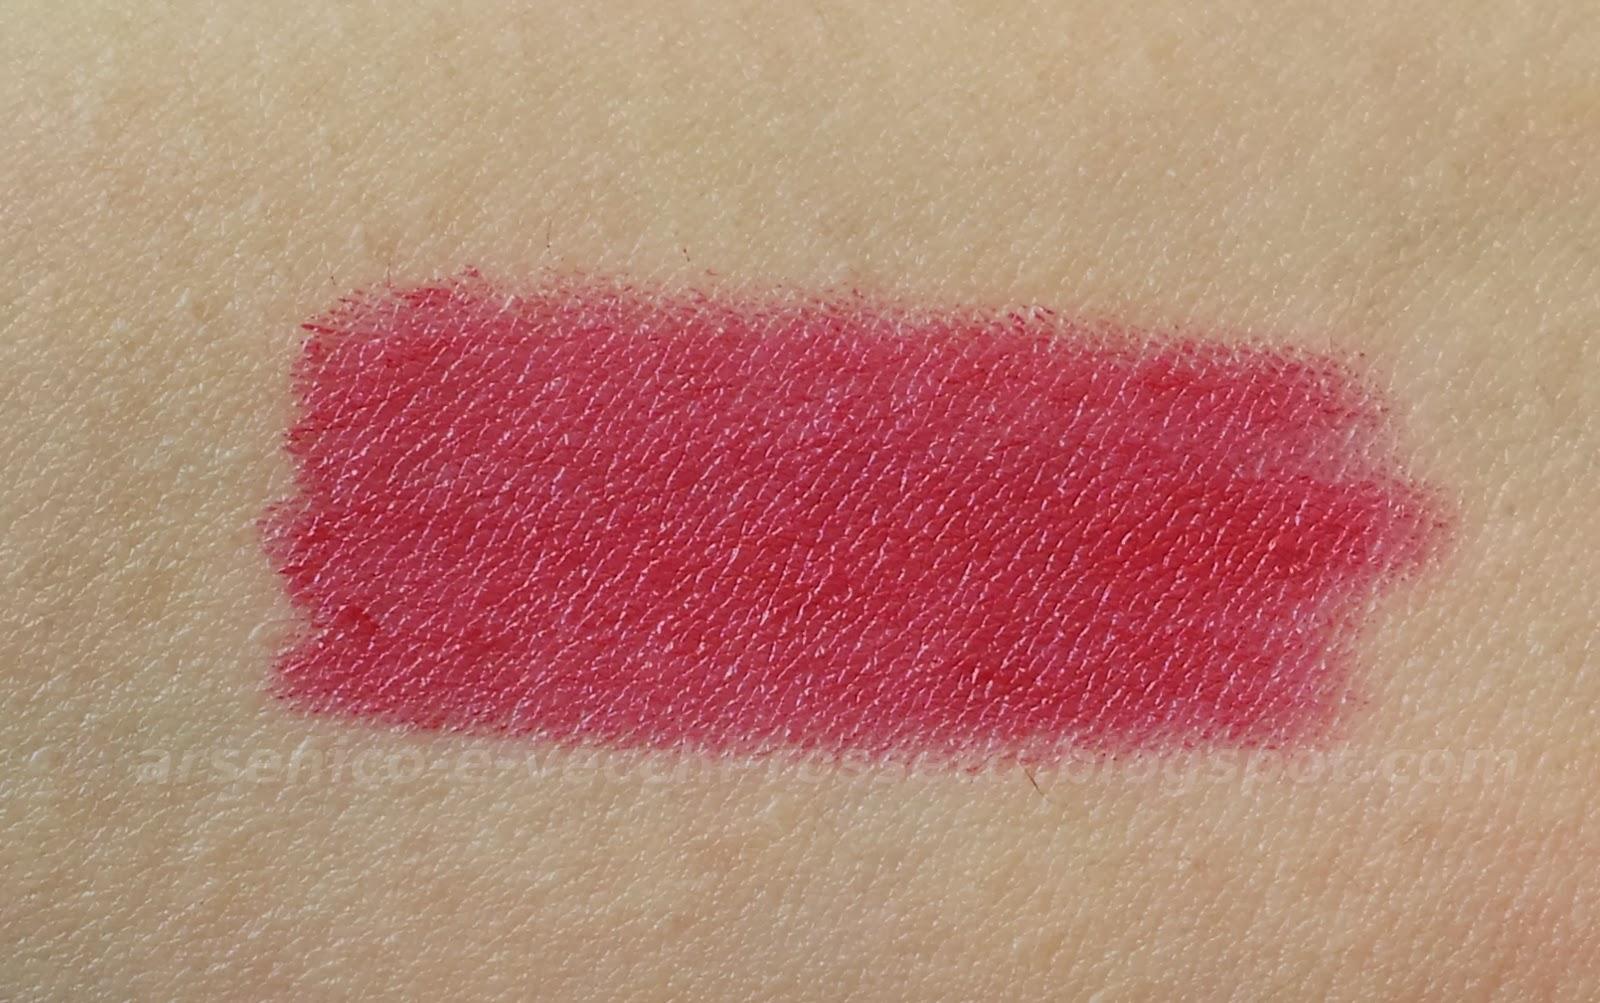 L'Oréal Paris Glam Shine Balmy Gloss #900 Miss Cherry